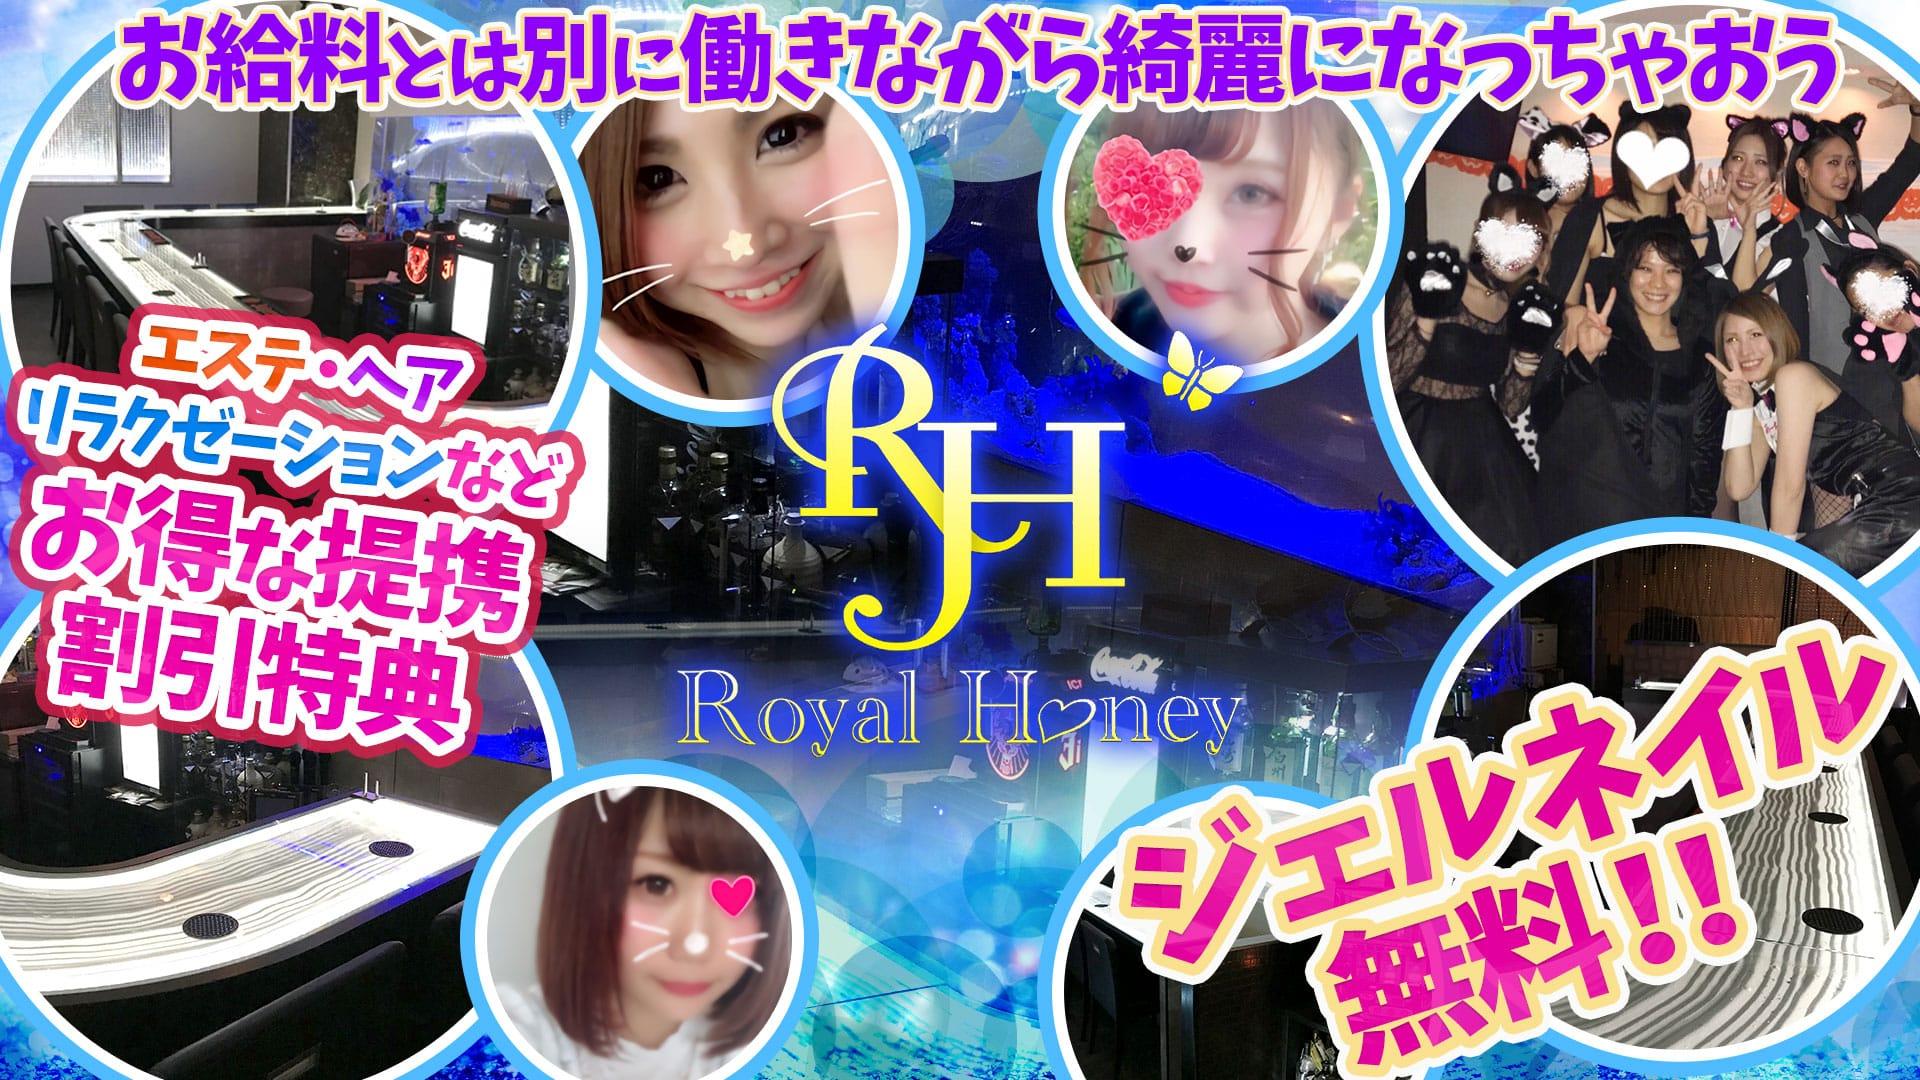 ROYAL HONEY<ロイヤルハニー> 五反田 ガールズバー TOP画像